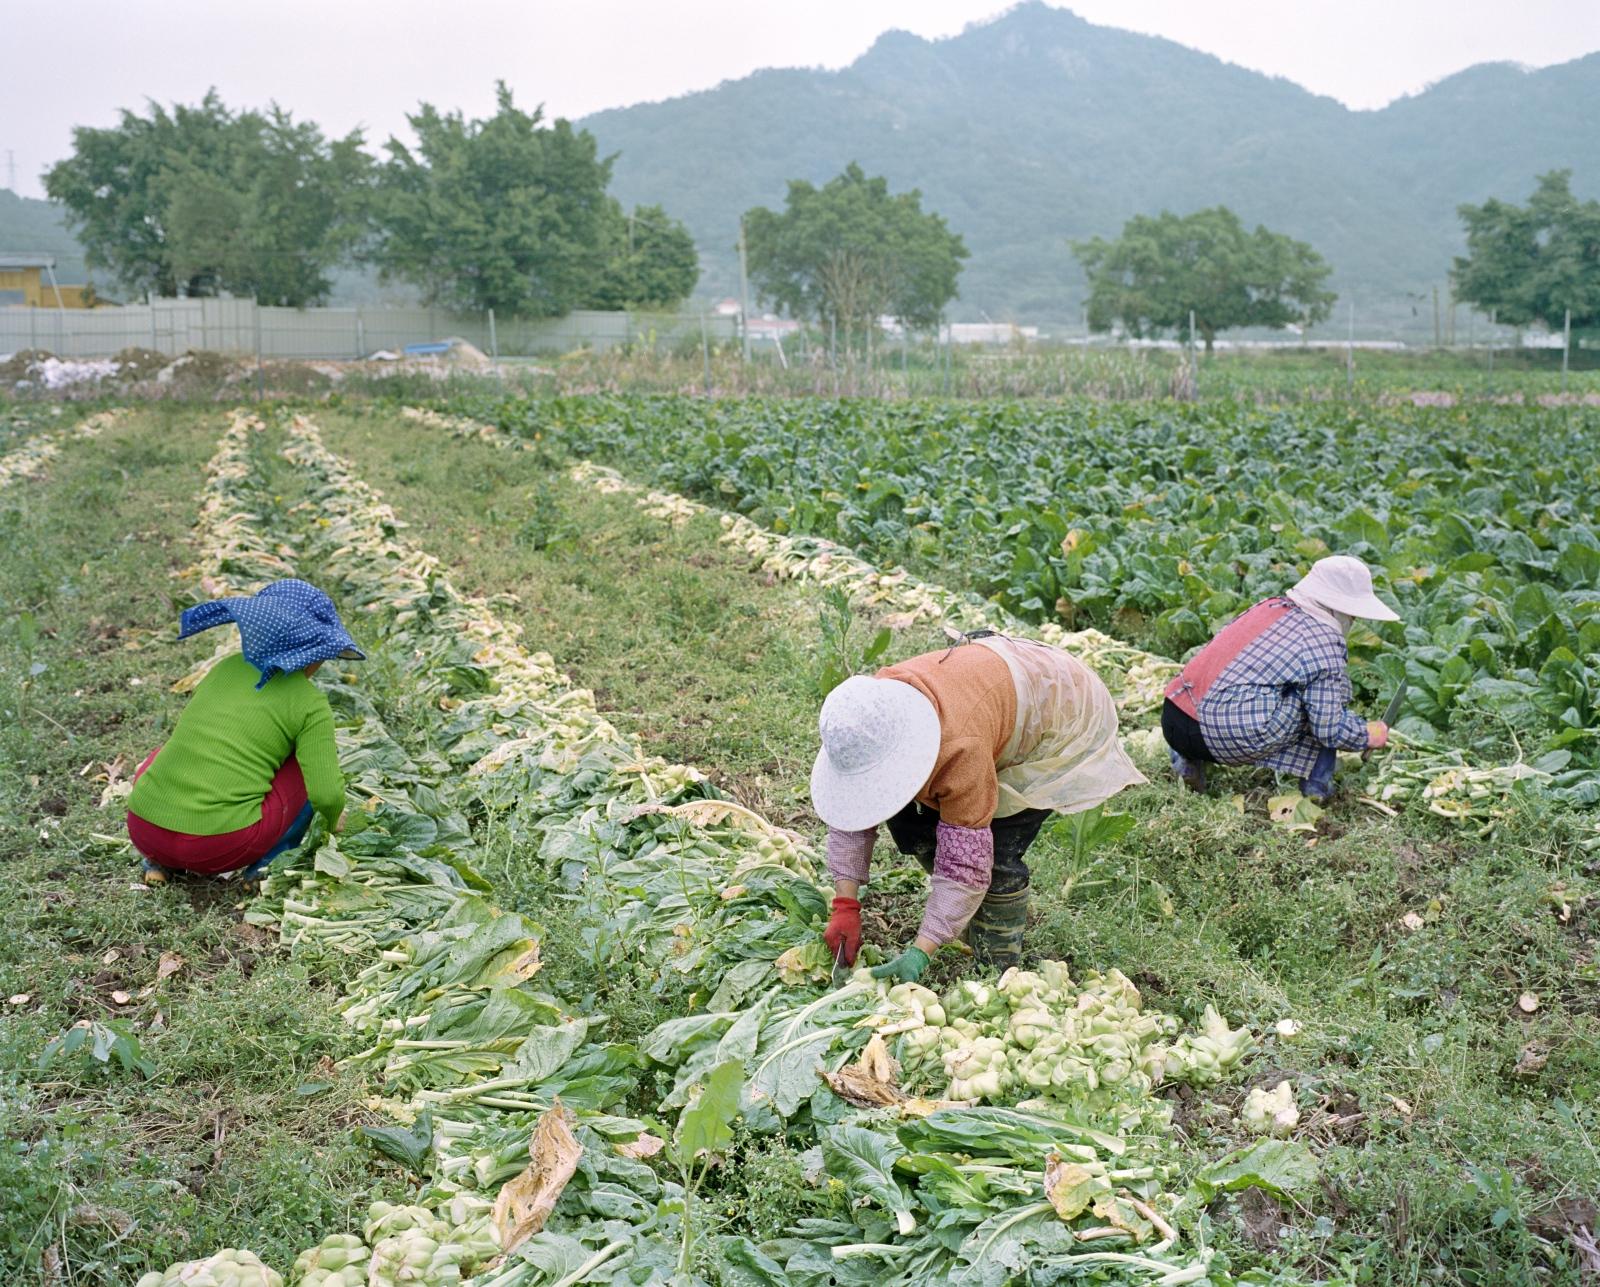 Harvest, Lang Qi Island 琅岐岛